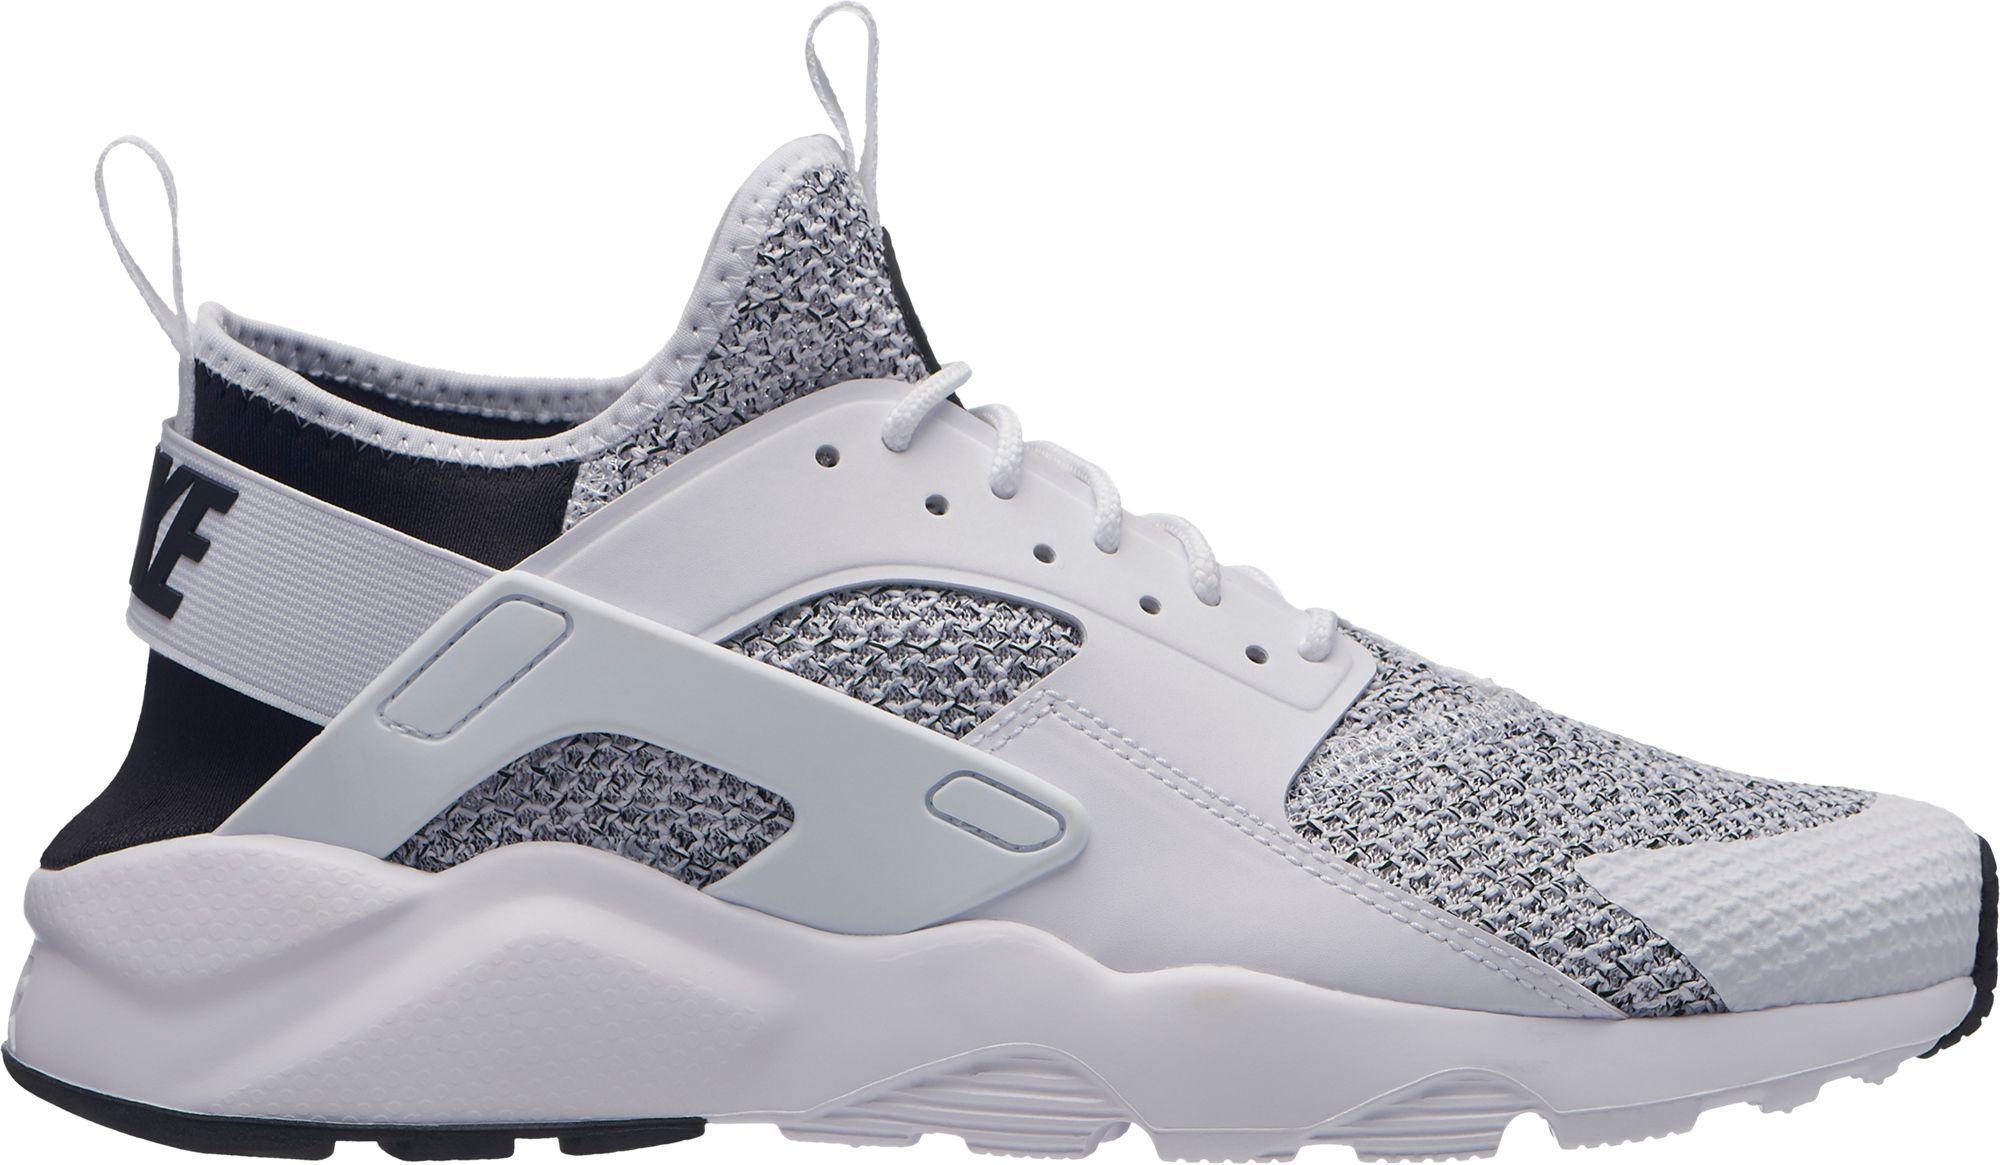 sports shoes c5e9c 8fd34 Nike Men s Air Huarache Run Ultra SE Shoes, White